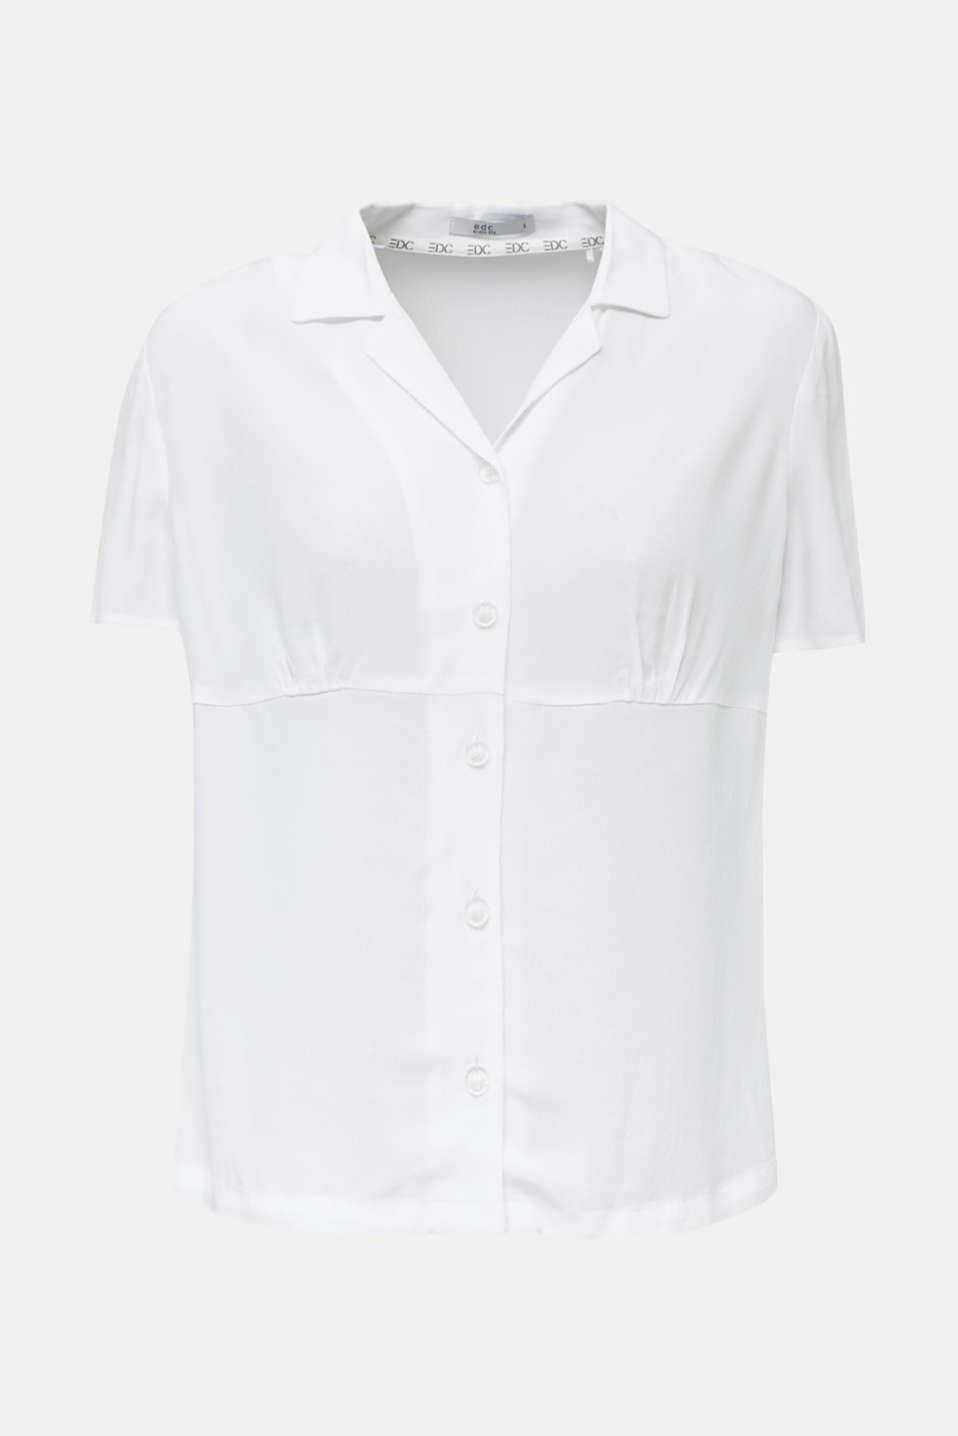 Blouse, LENZING™ ECOVERO™, WHITE, detail image number 6